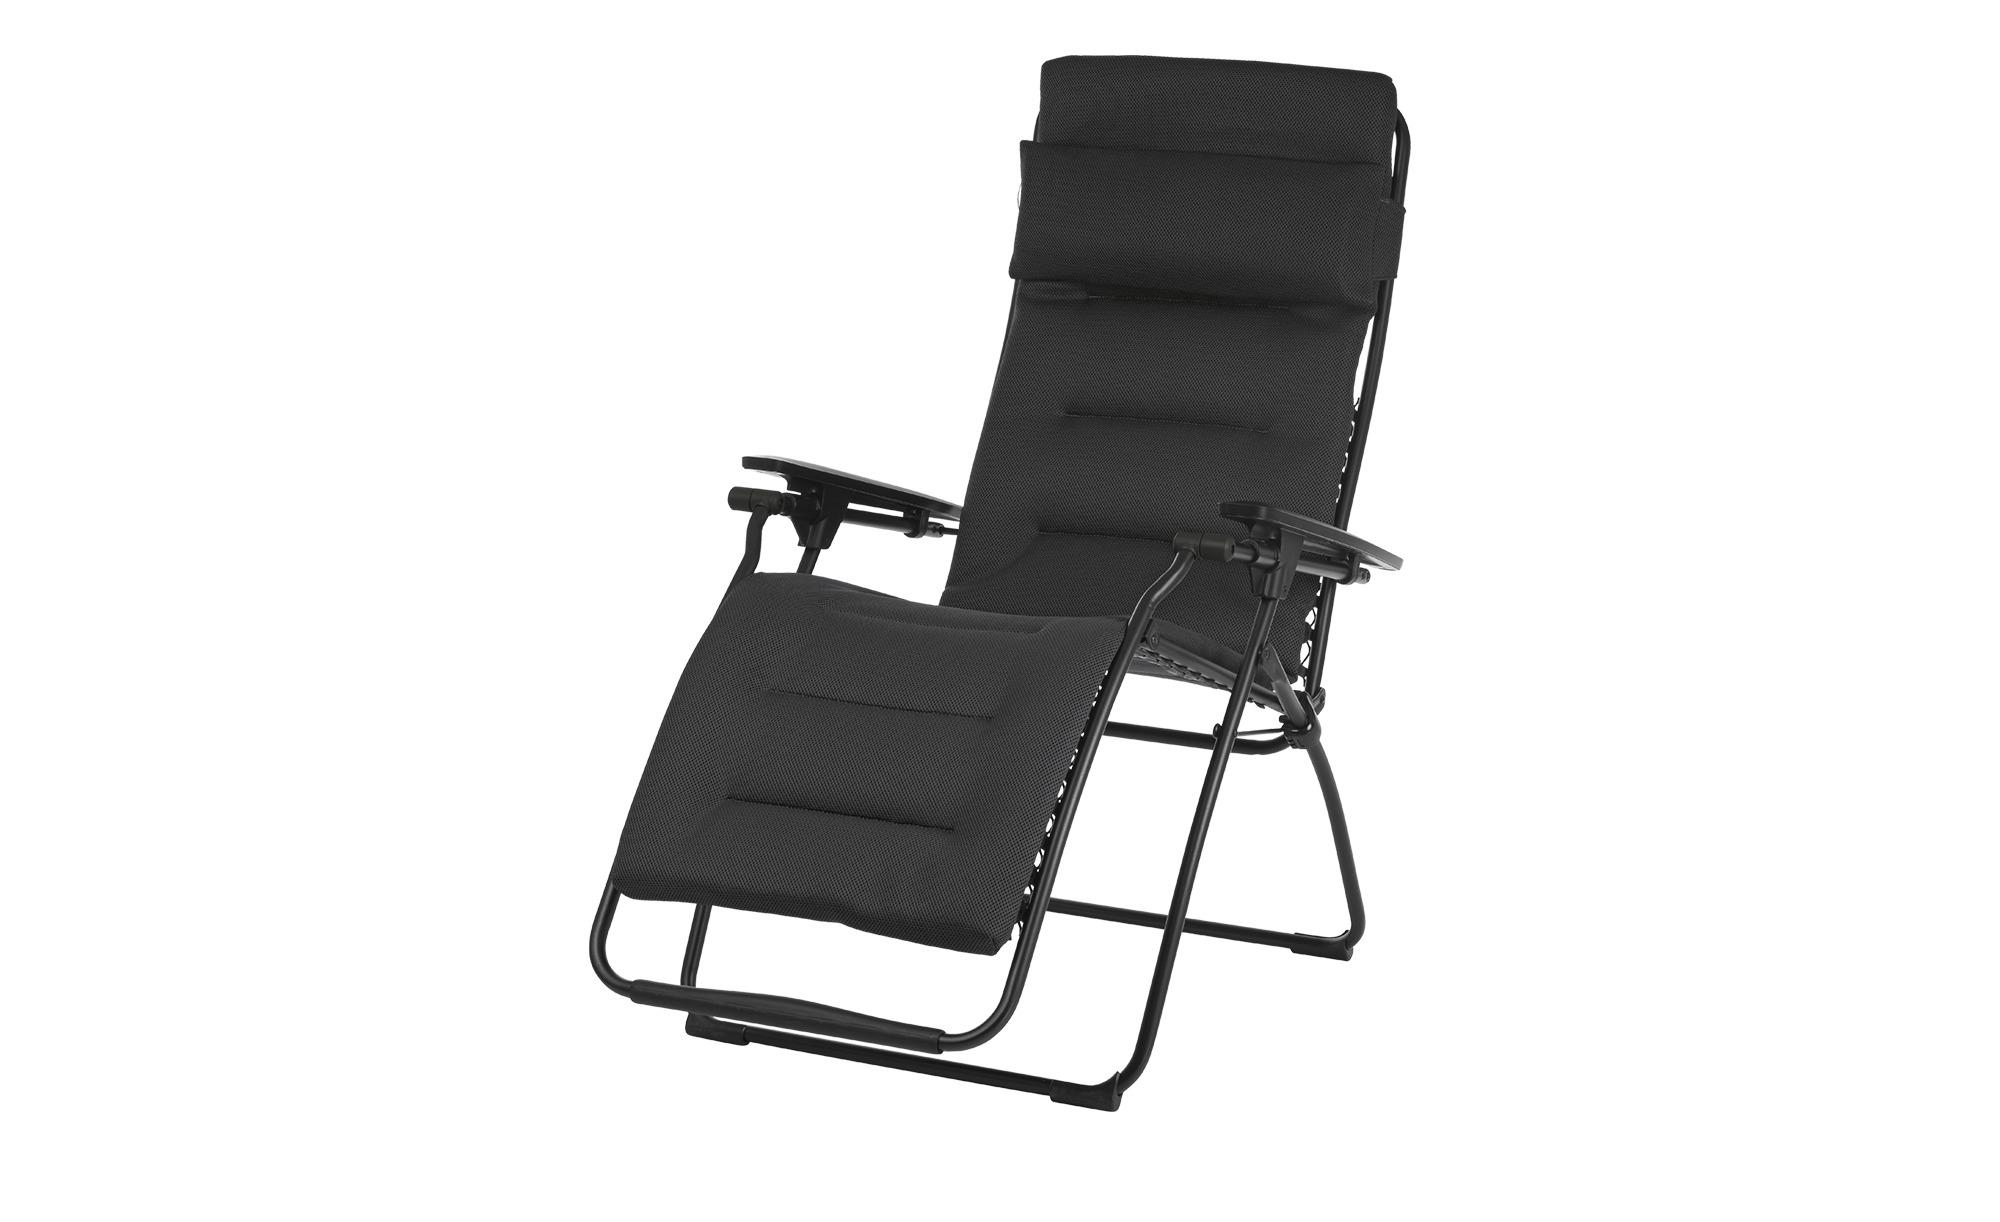 Relaxsessel  Futura Air Comfort ¦ grau ¦ Maße (cm): B: 71 H: 83 T: 113 Garten > Gartenmöbel > Gartenstühle - Höffner